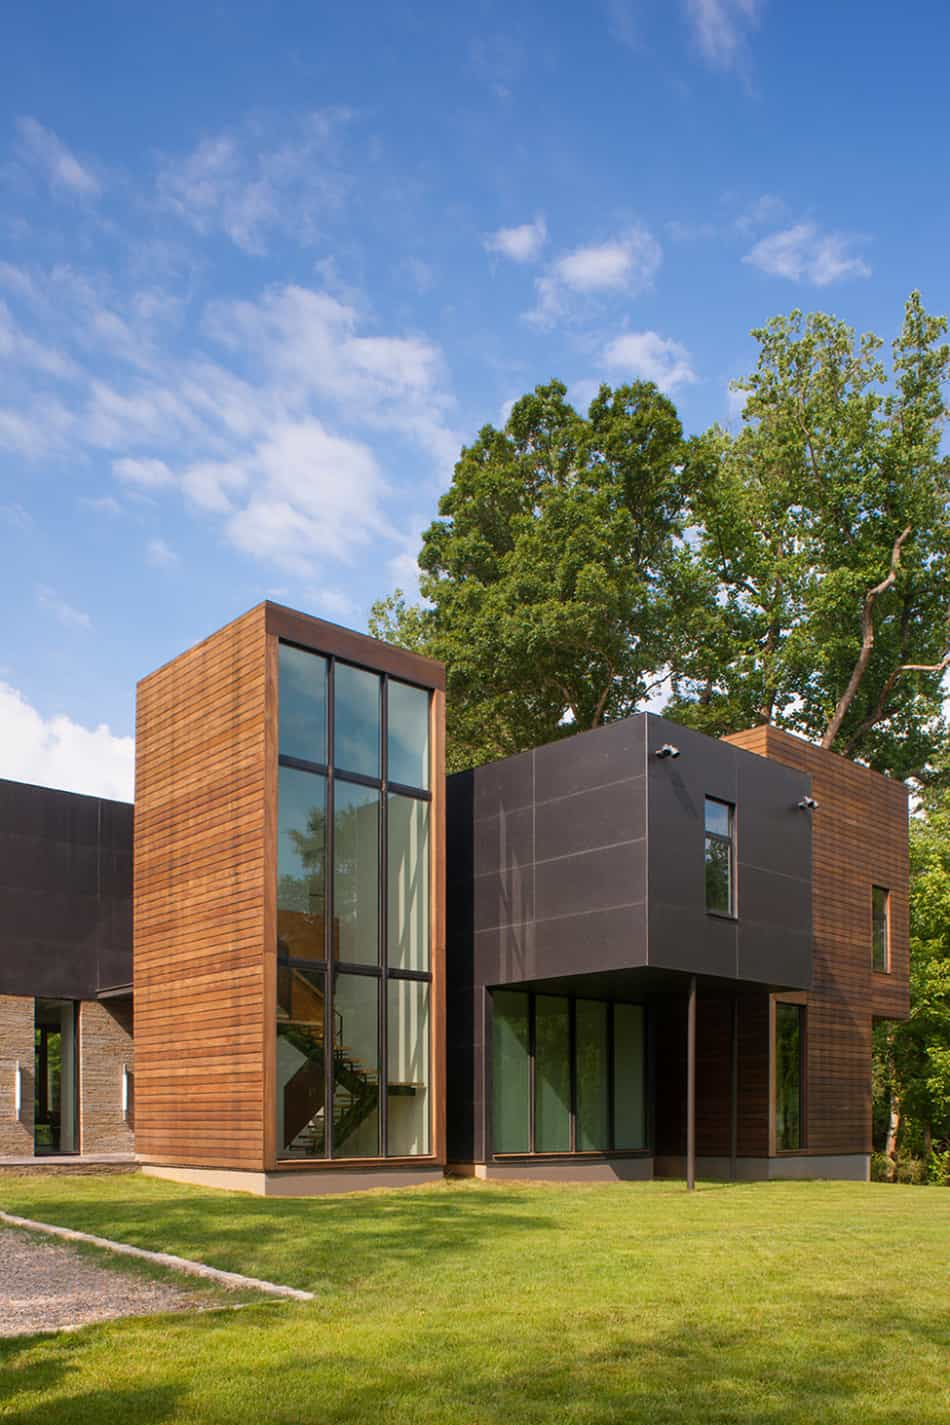 Modern Box House with Interior Glass Bridges | Modern ... on Modern Glass House Design  id=69291